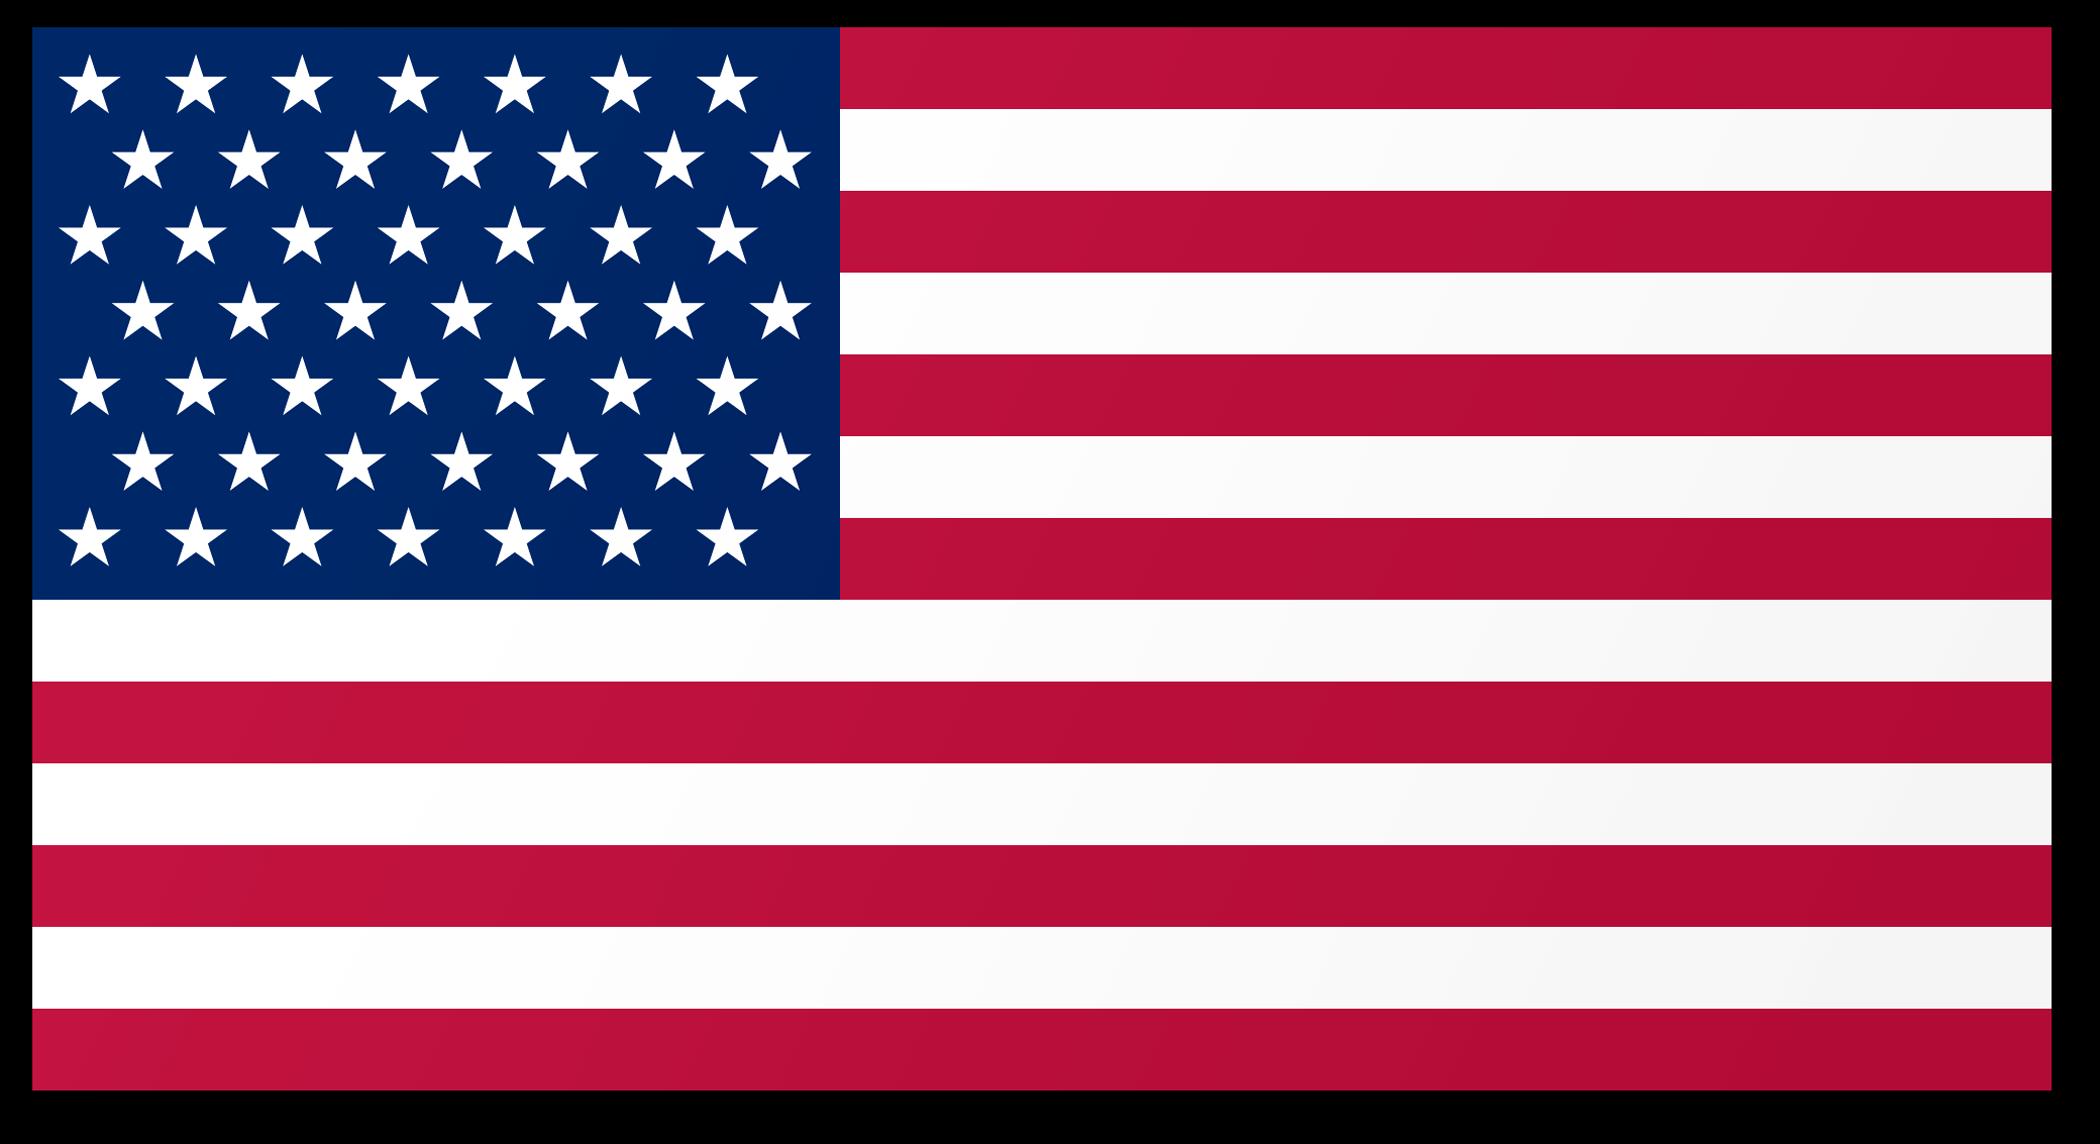 American Flag PNG Image.